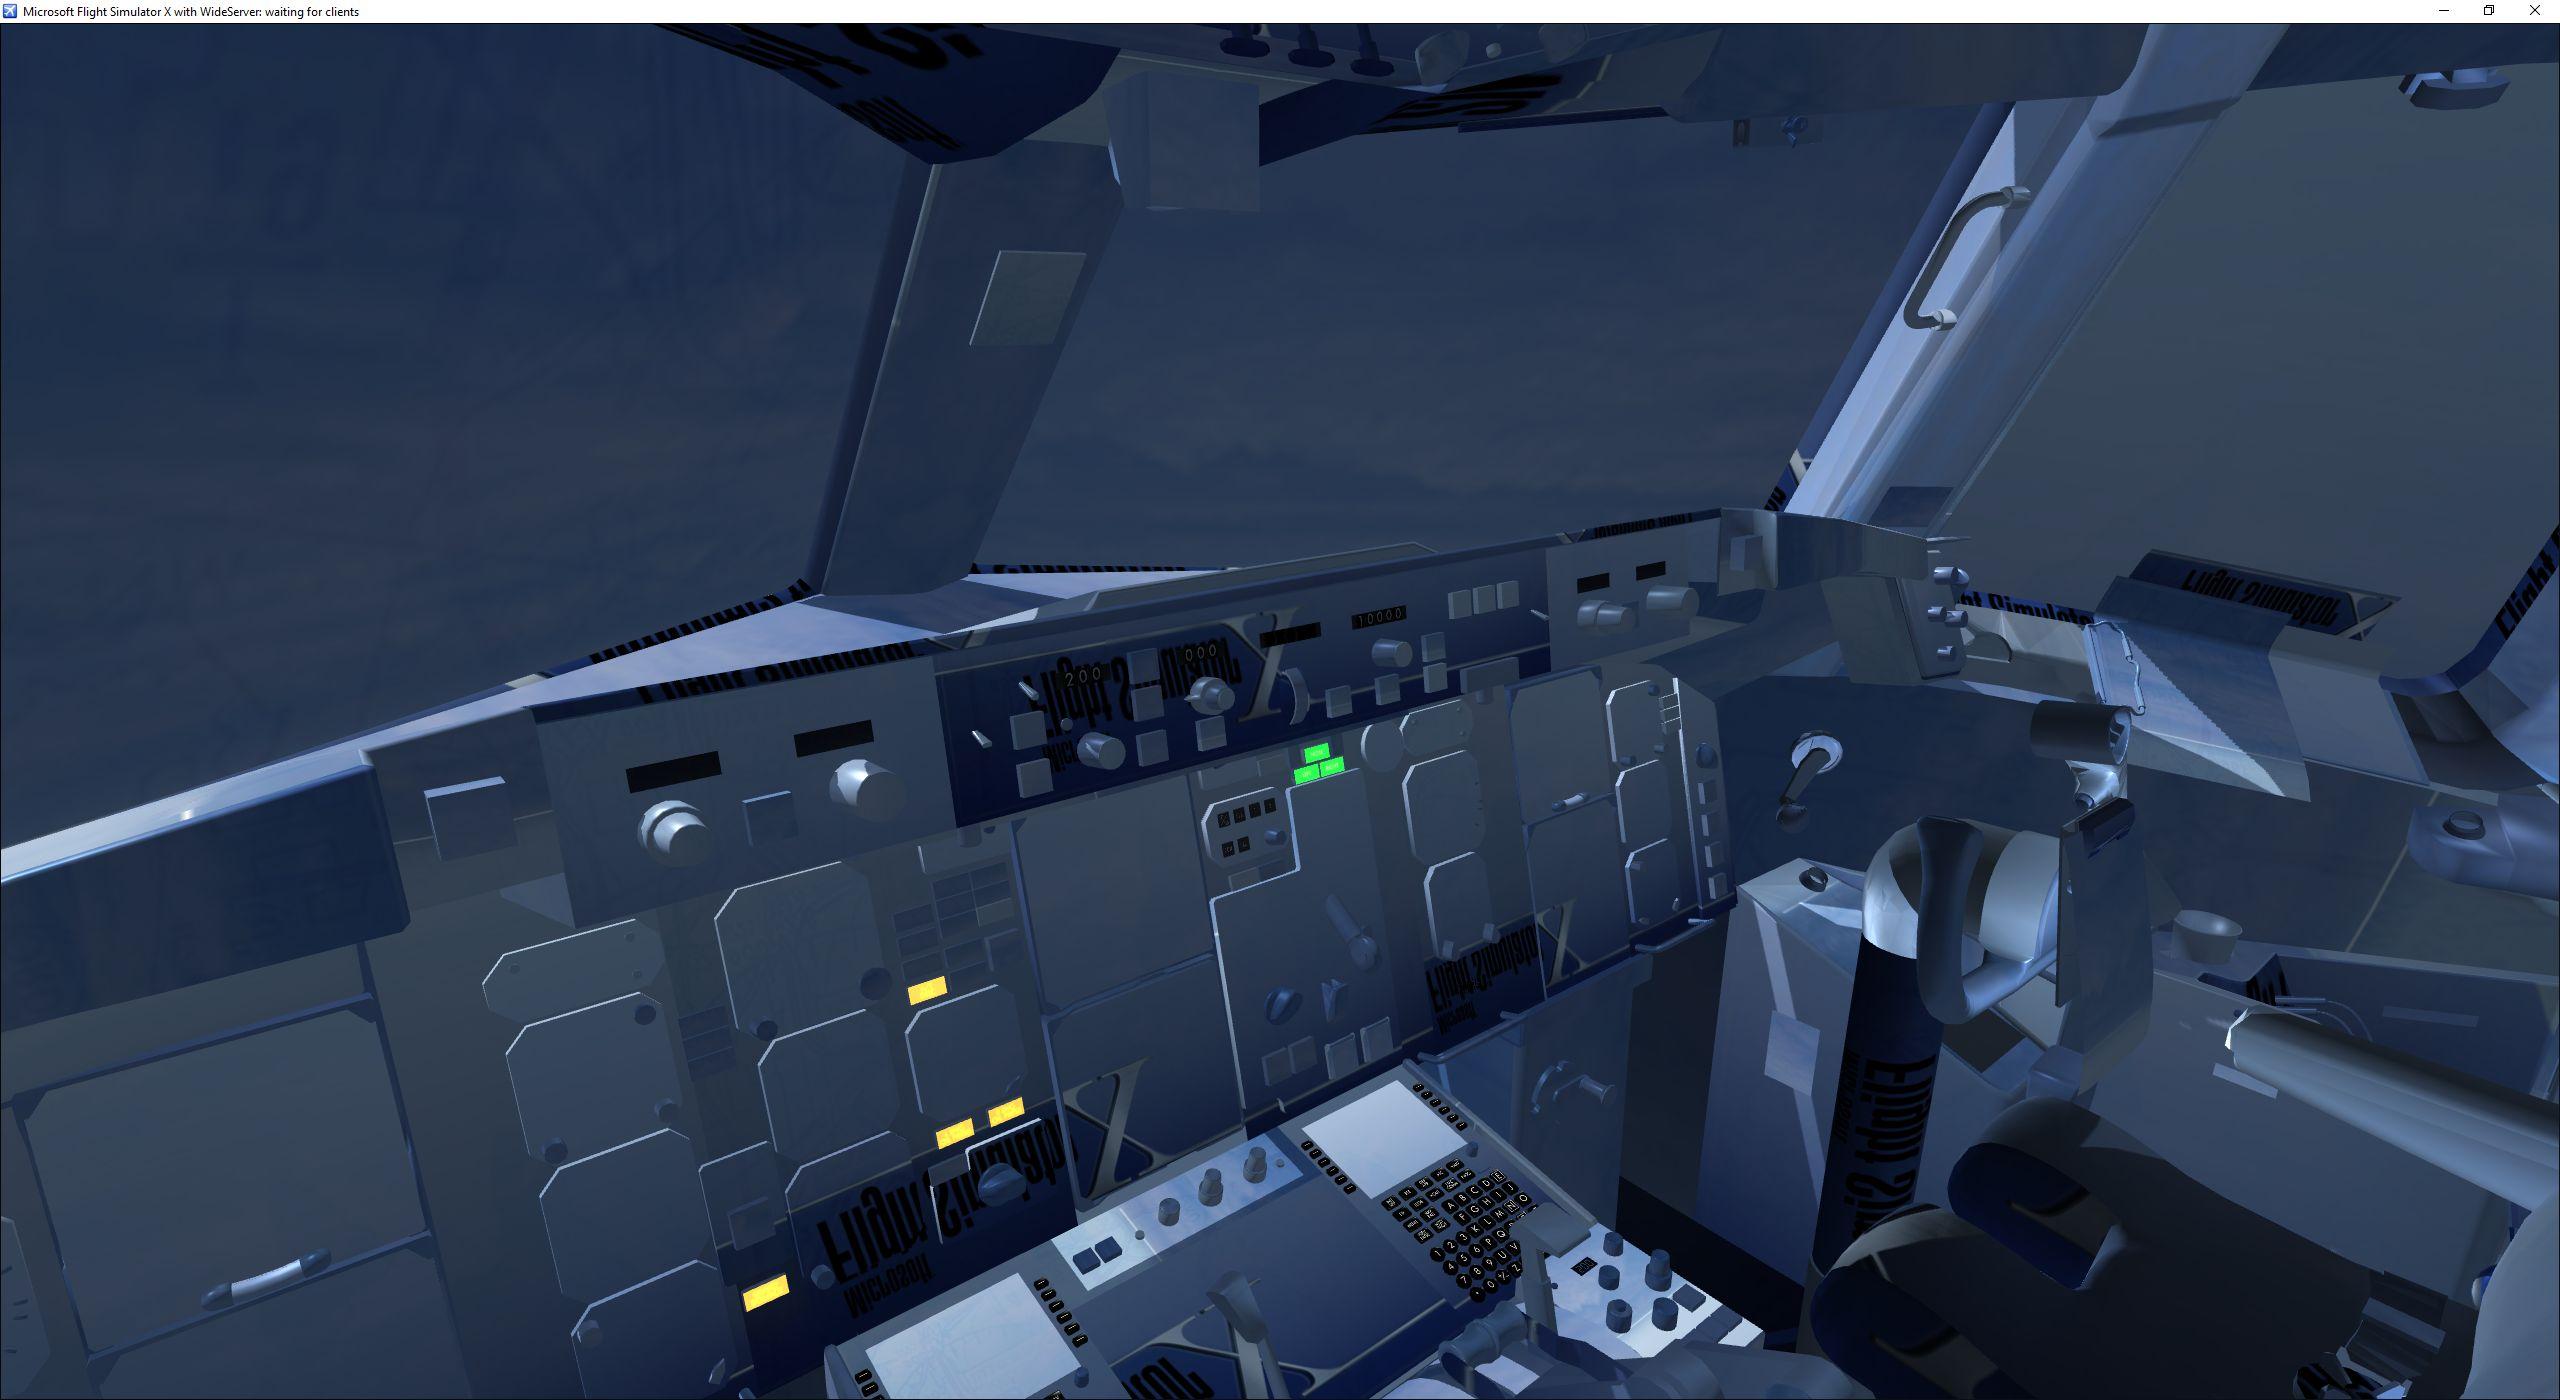 CS-757-300.jpg